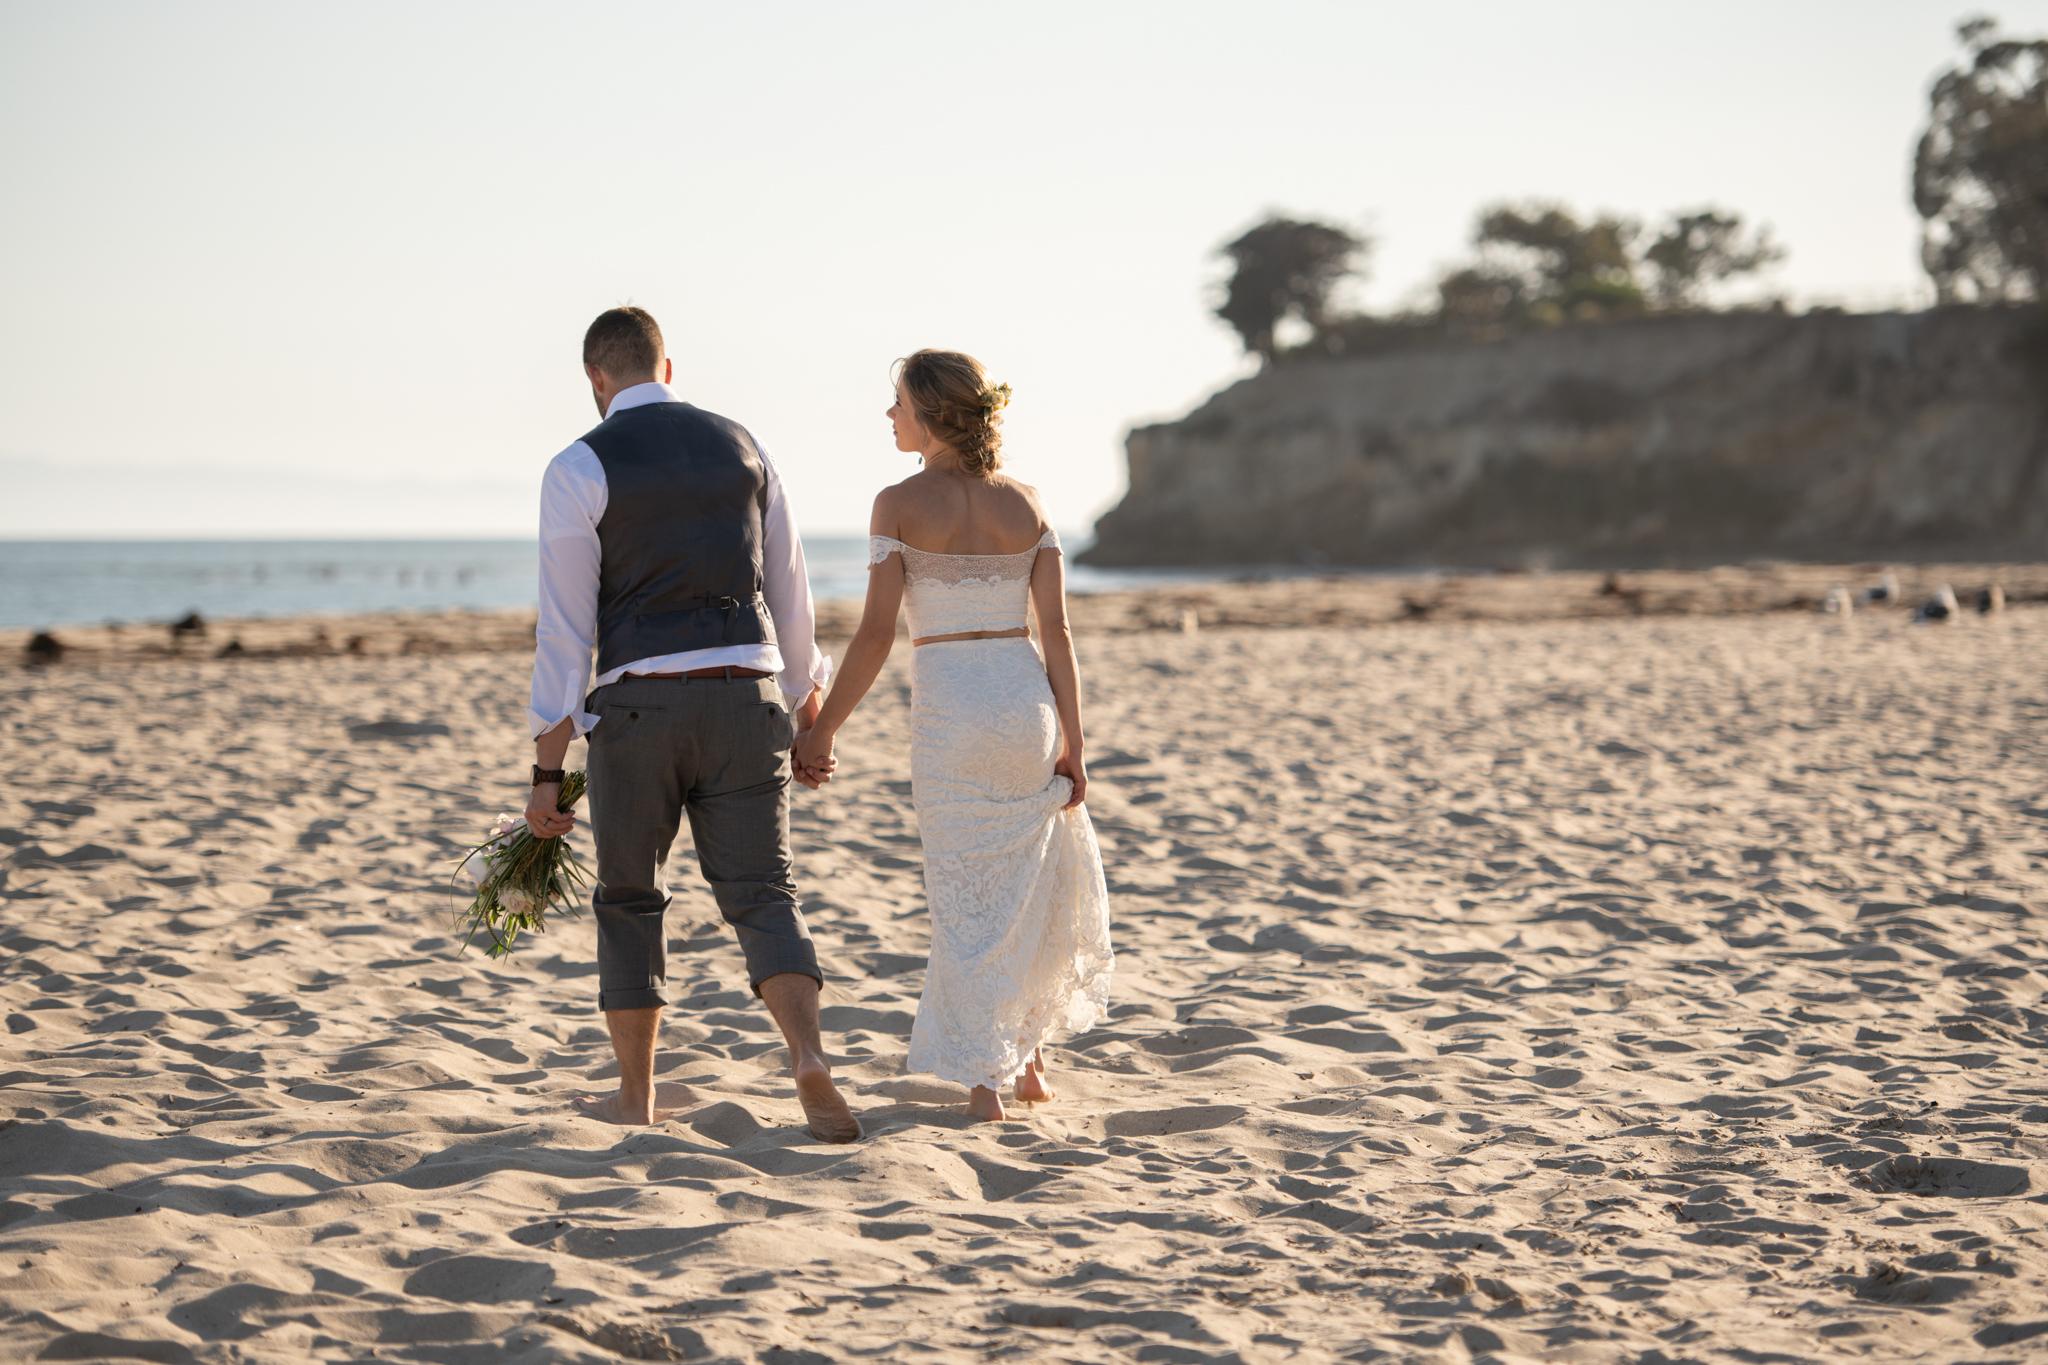 62_PRVW_Jenny_Ken_Wedding_Trevor_Hooper_Photo.jpg